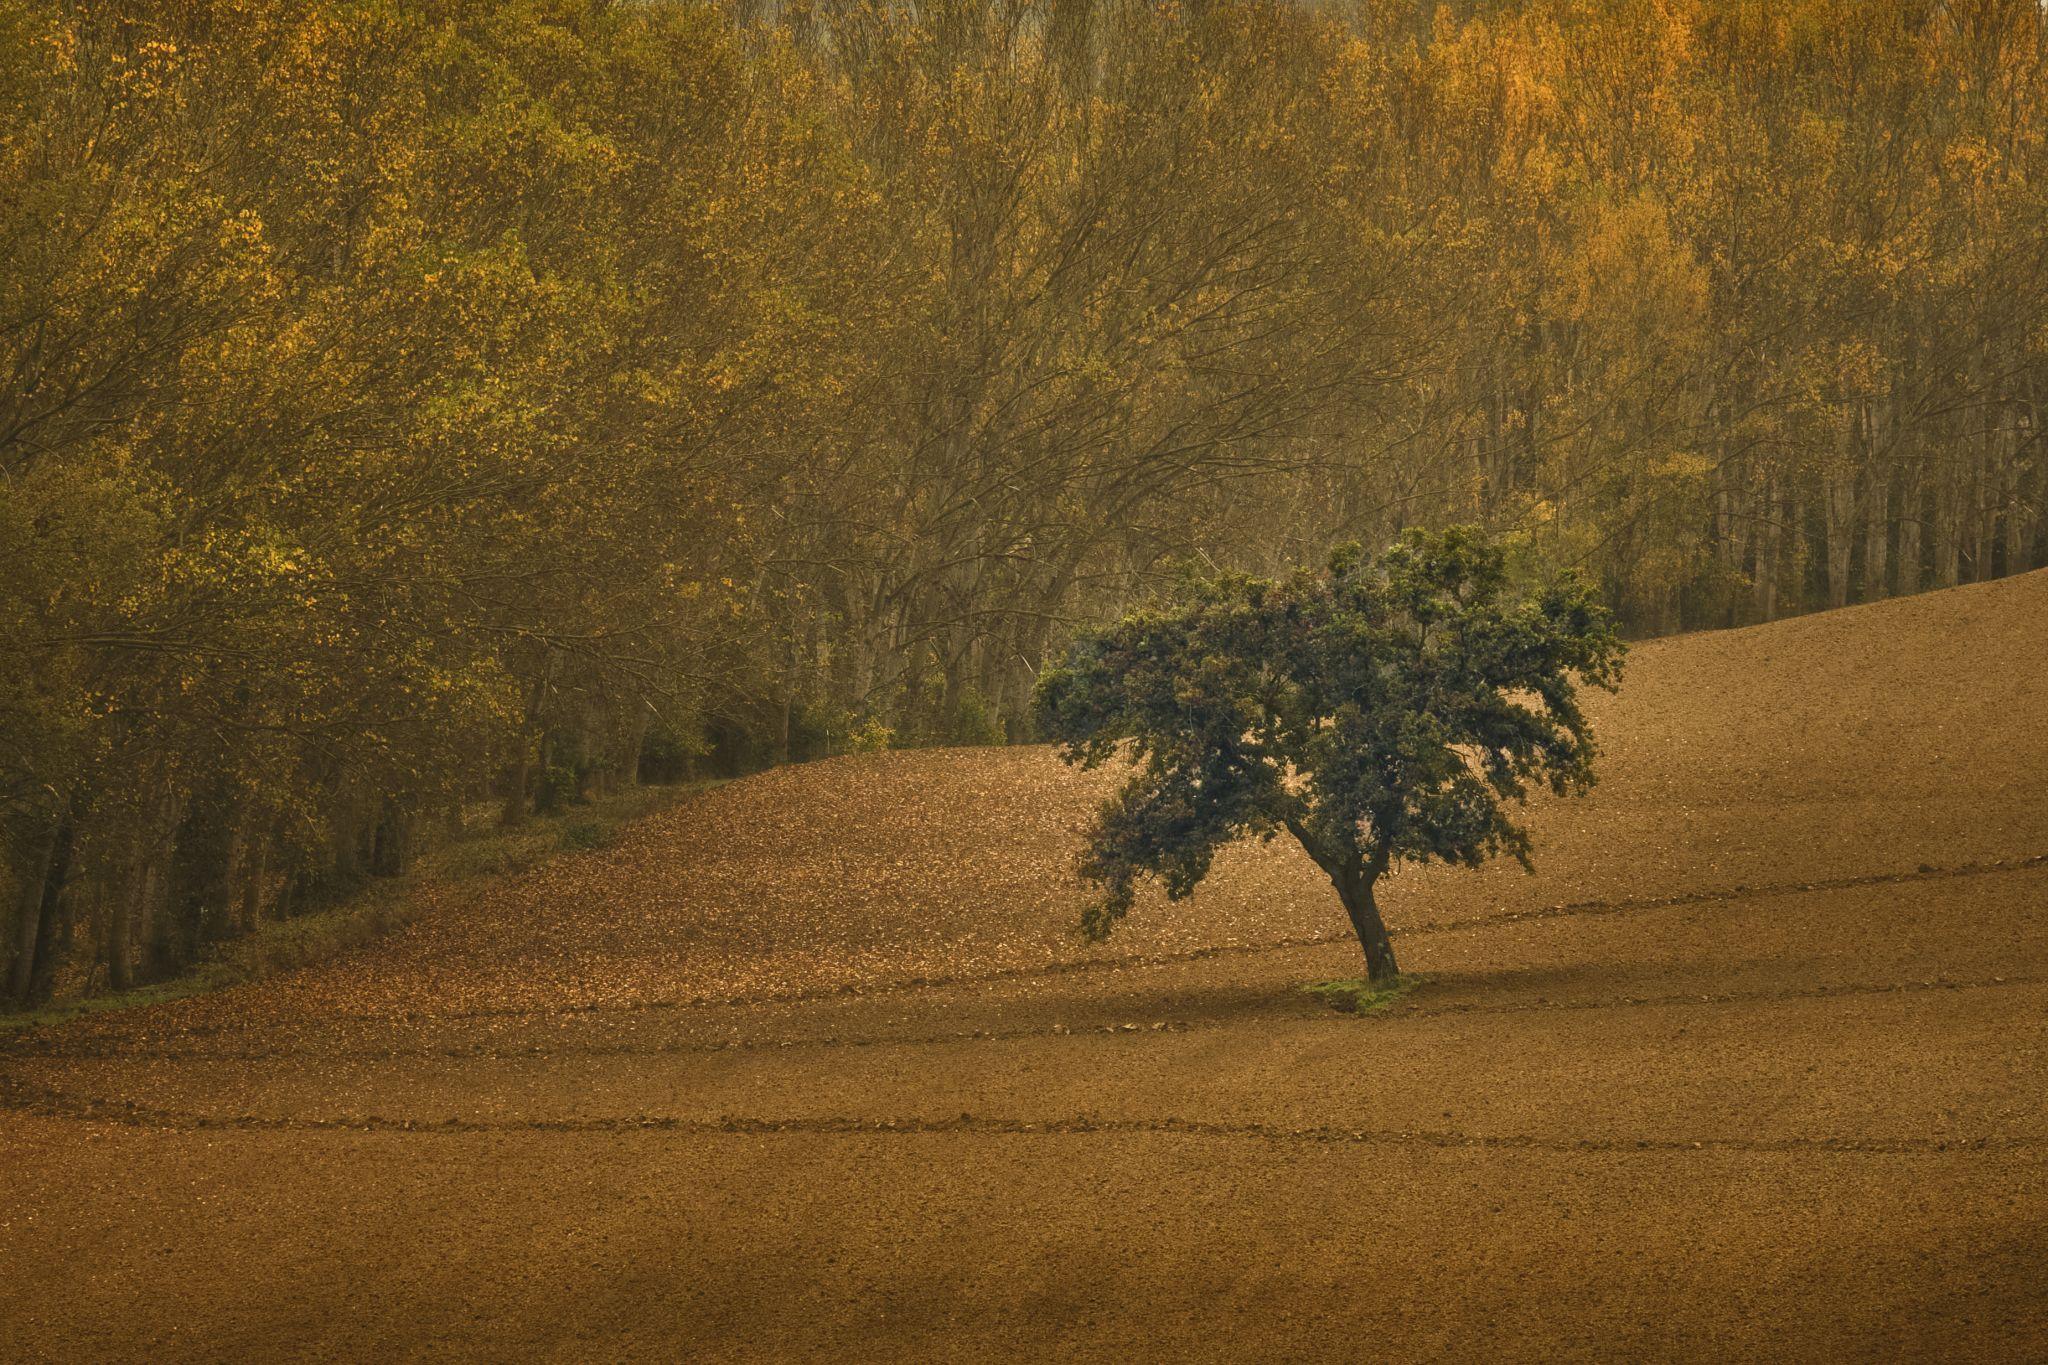 Tree on the field, Italy